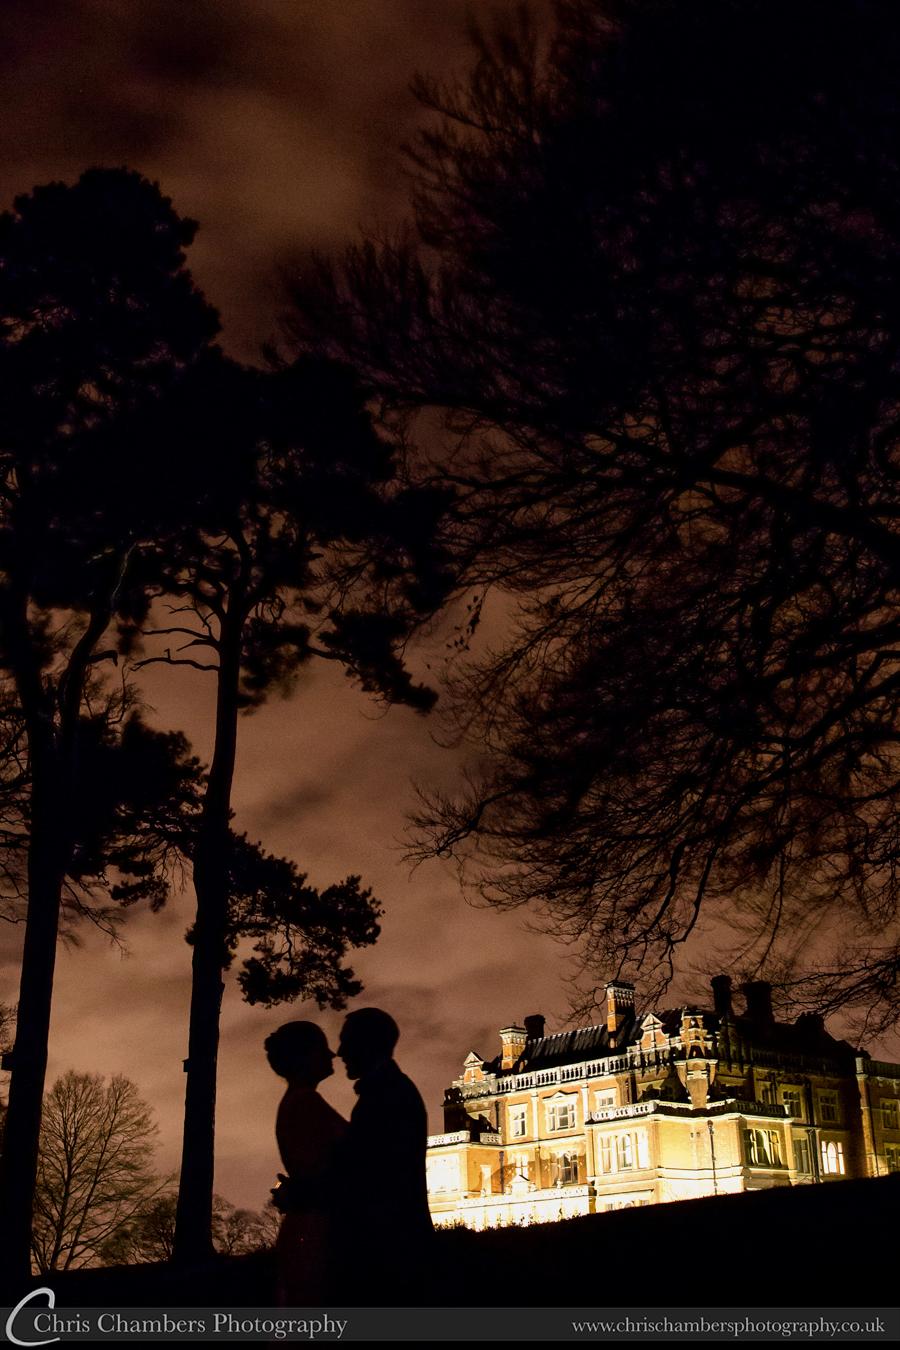 Rossington Hall weddingphotography : Wedding photographer at Rossington Hall : Doncaster. Chris Chambers Award winning wedding photographer Yorkshire